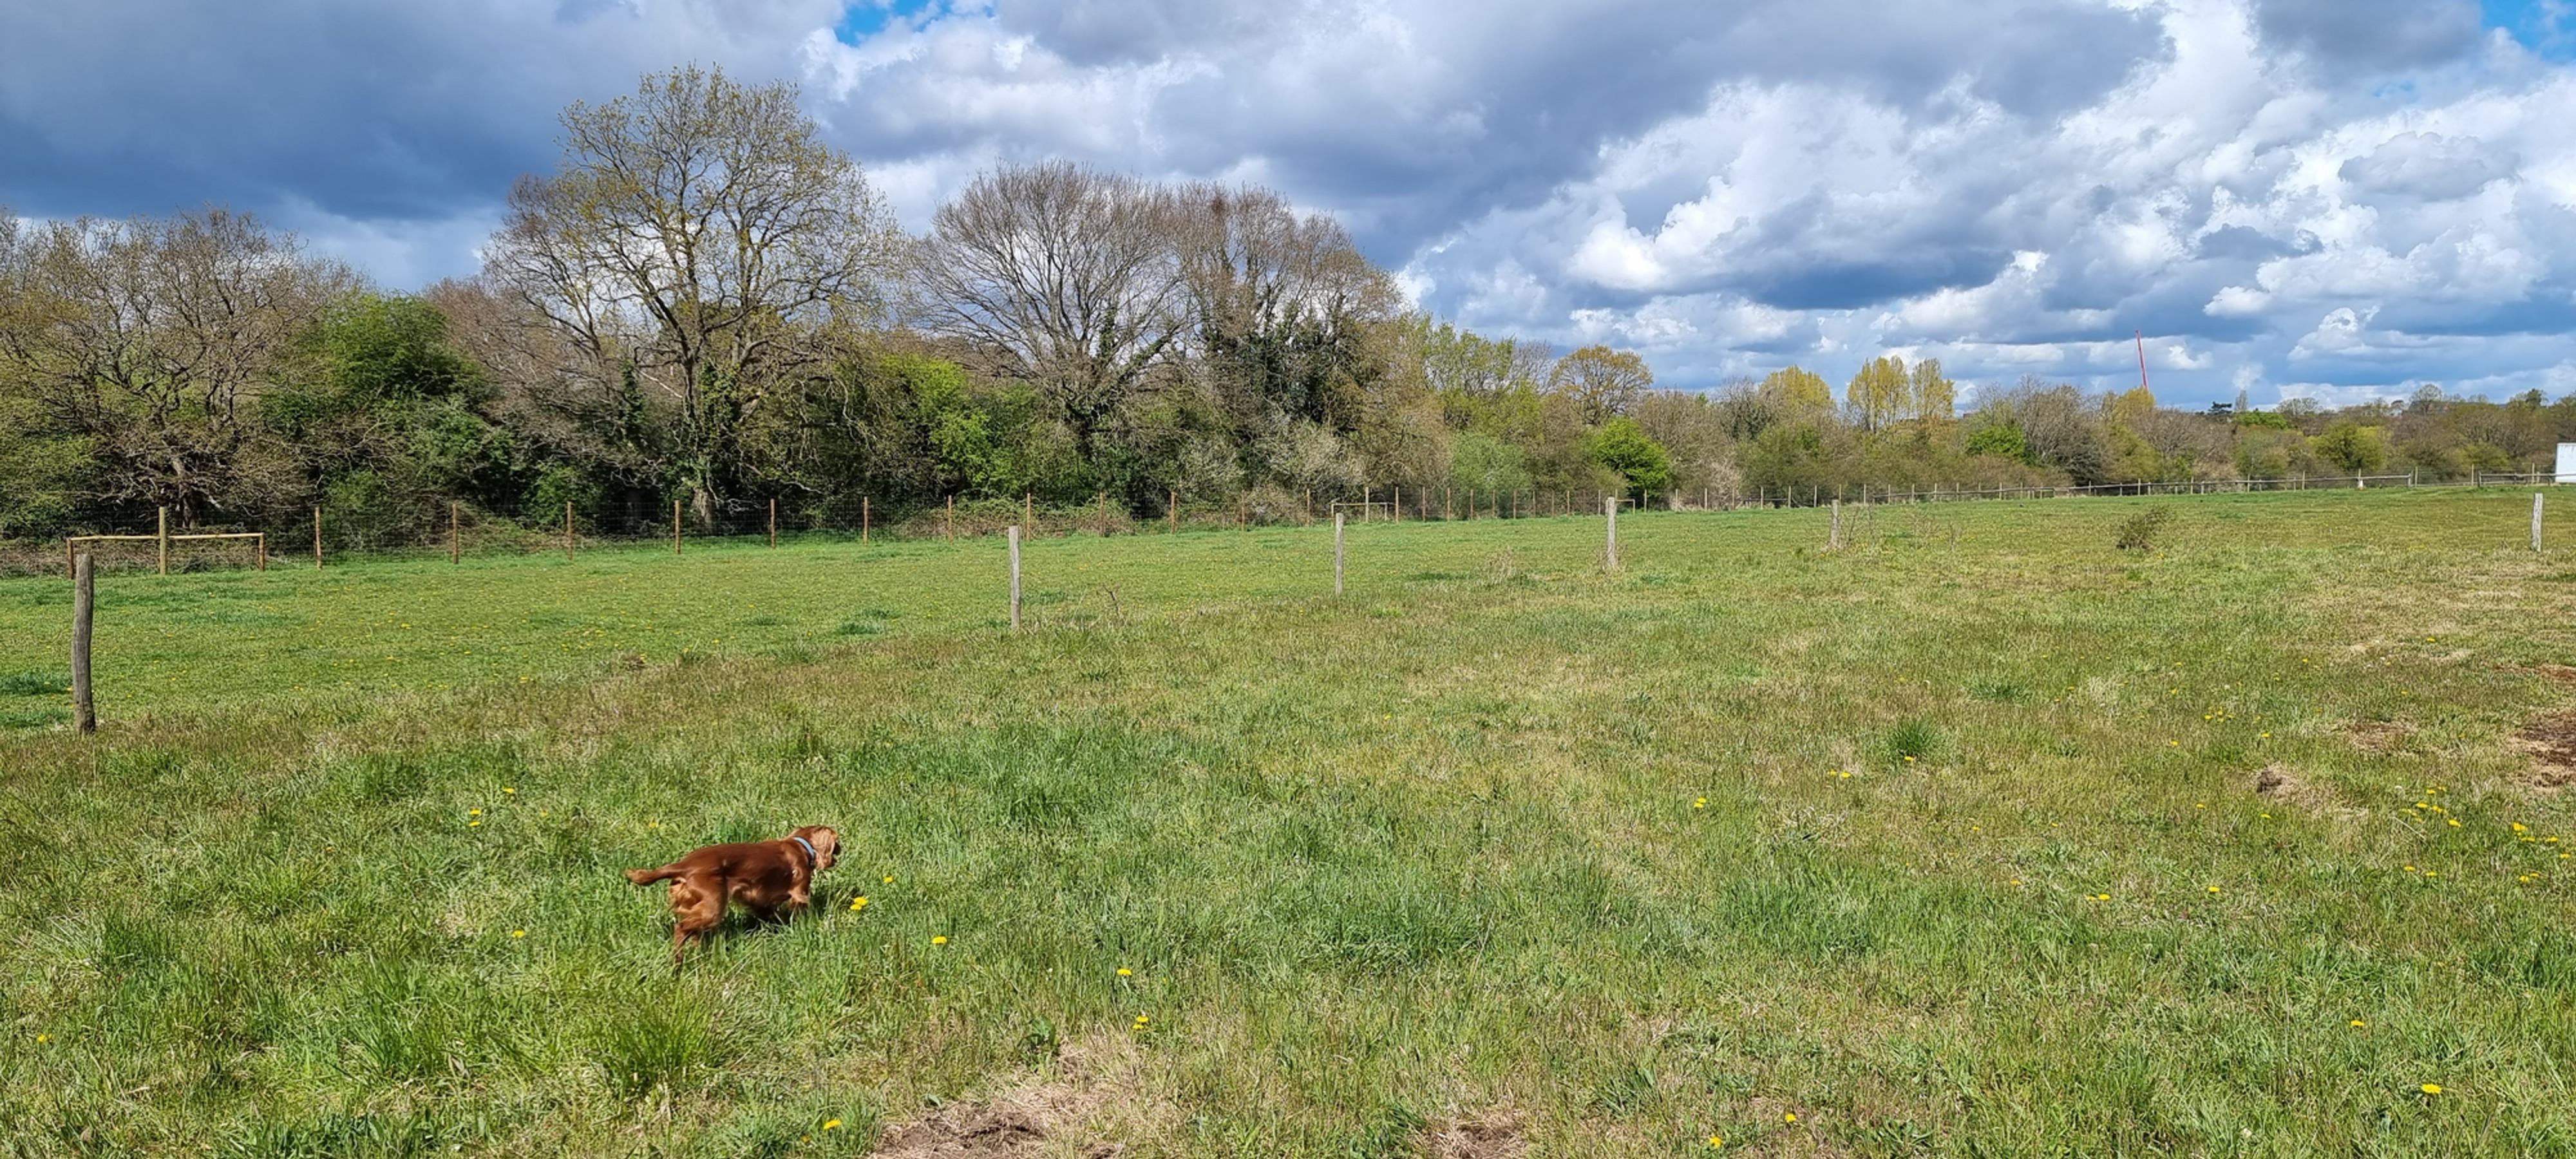 WOKINGHAM (Field 1) - 30 Minutes